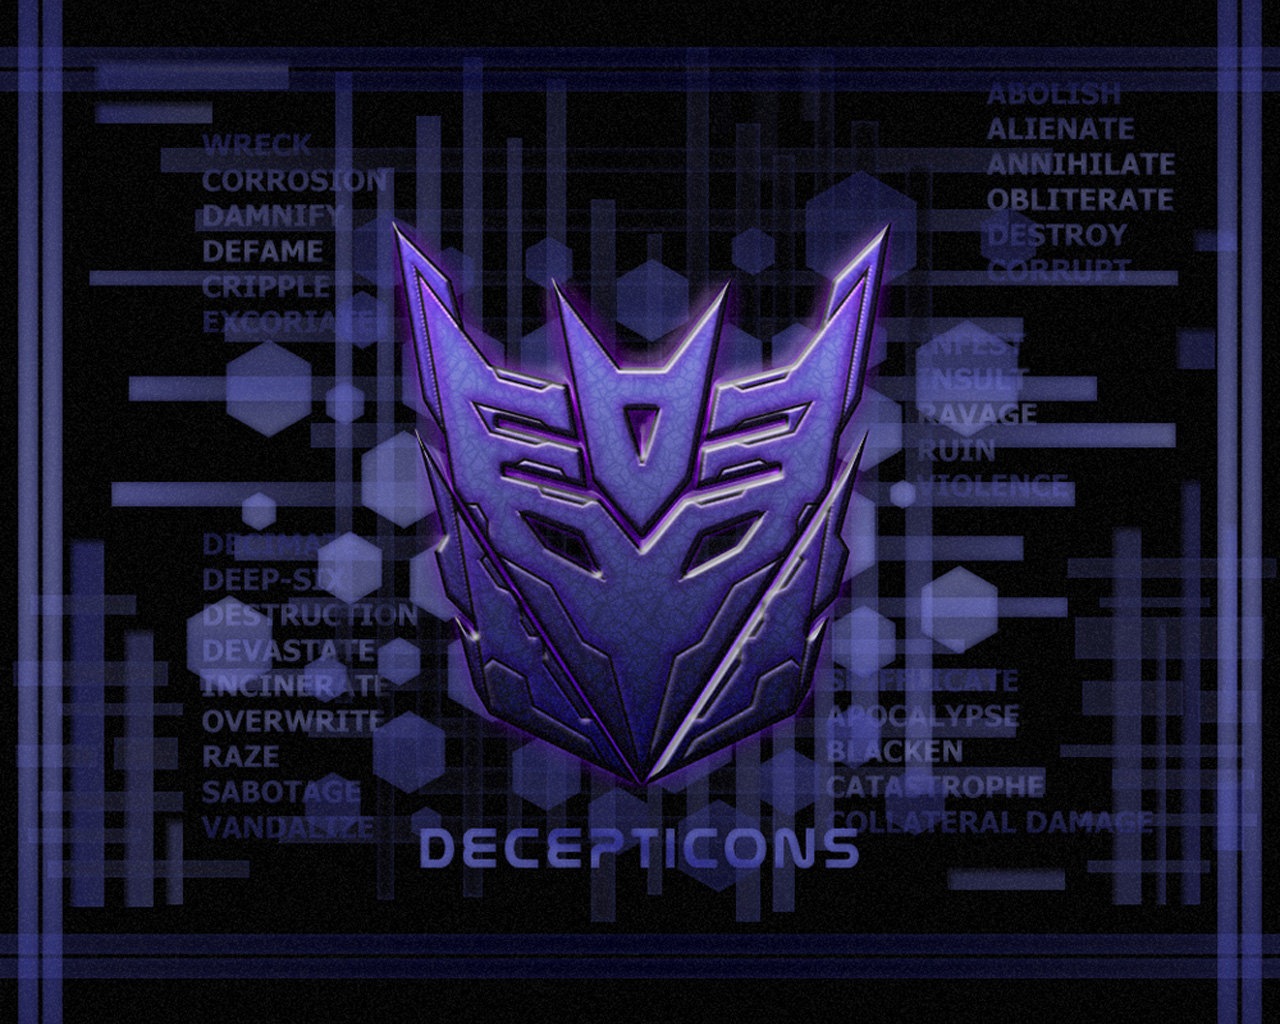 Transformers Fall Of Cybertron Wallpaper 1920x1080 Transformers Matrix Wallpapers Insignia Deceptocon G1 3d